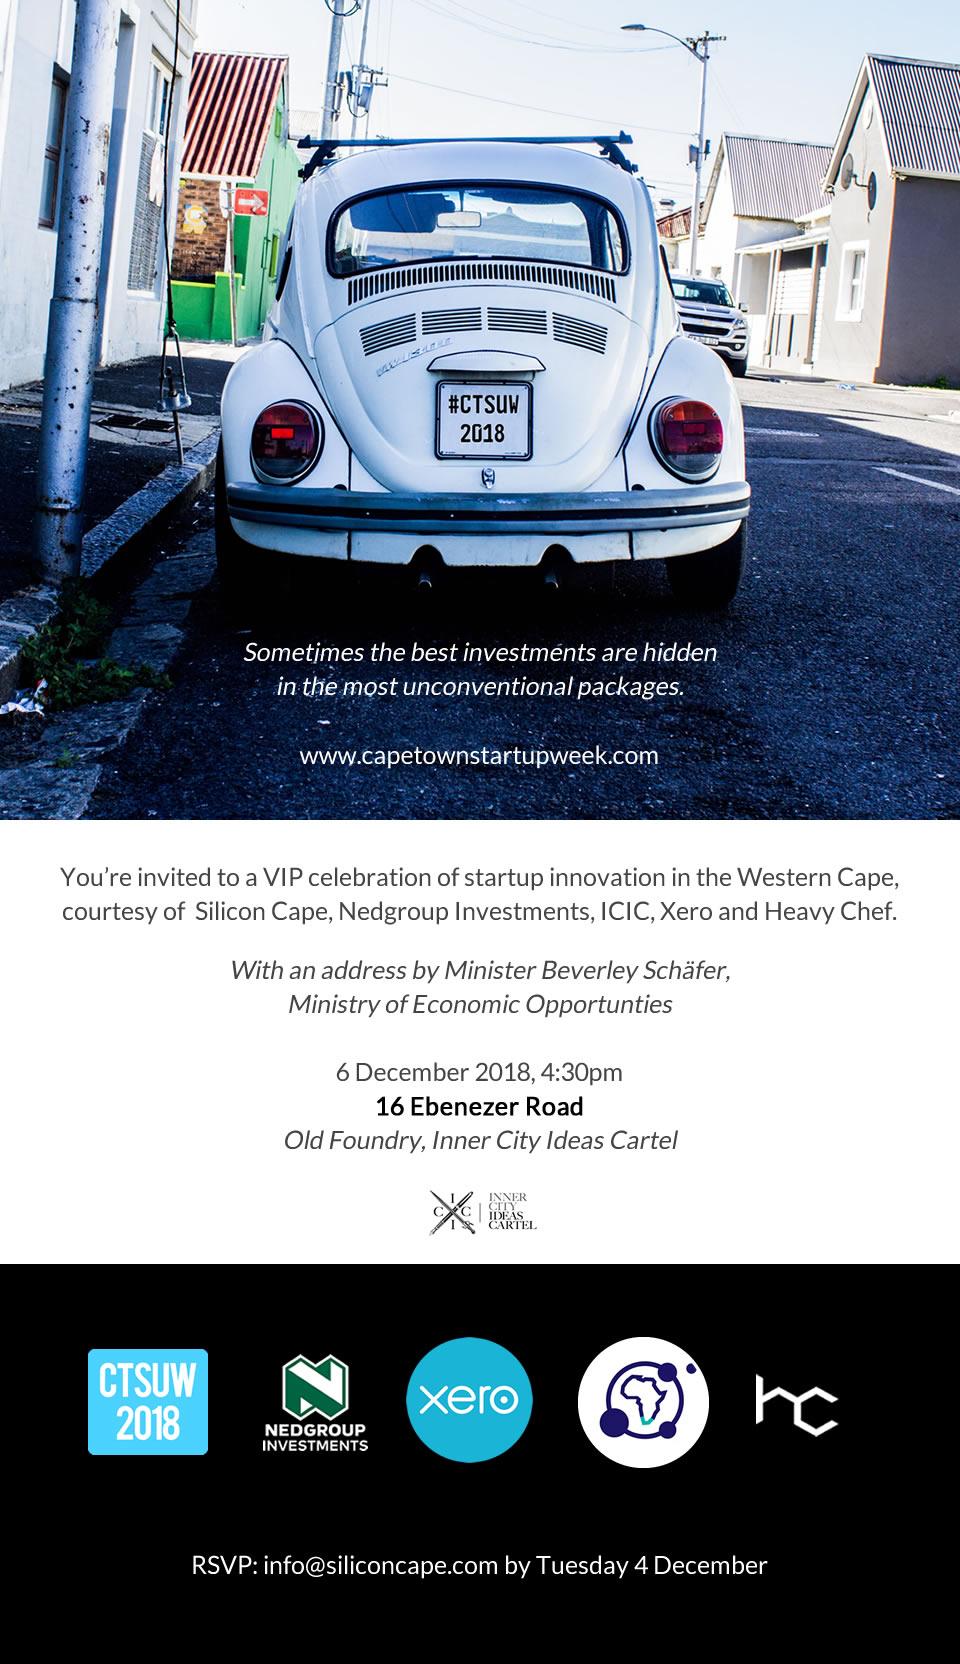 20181206-CTSUW-VIP-invite.jpg